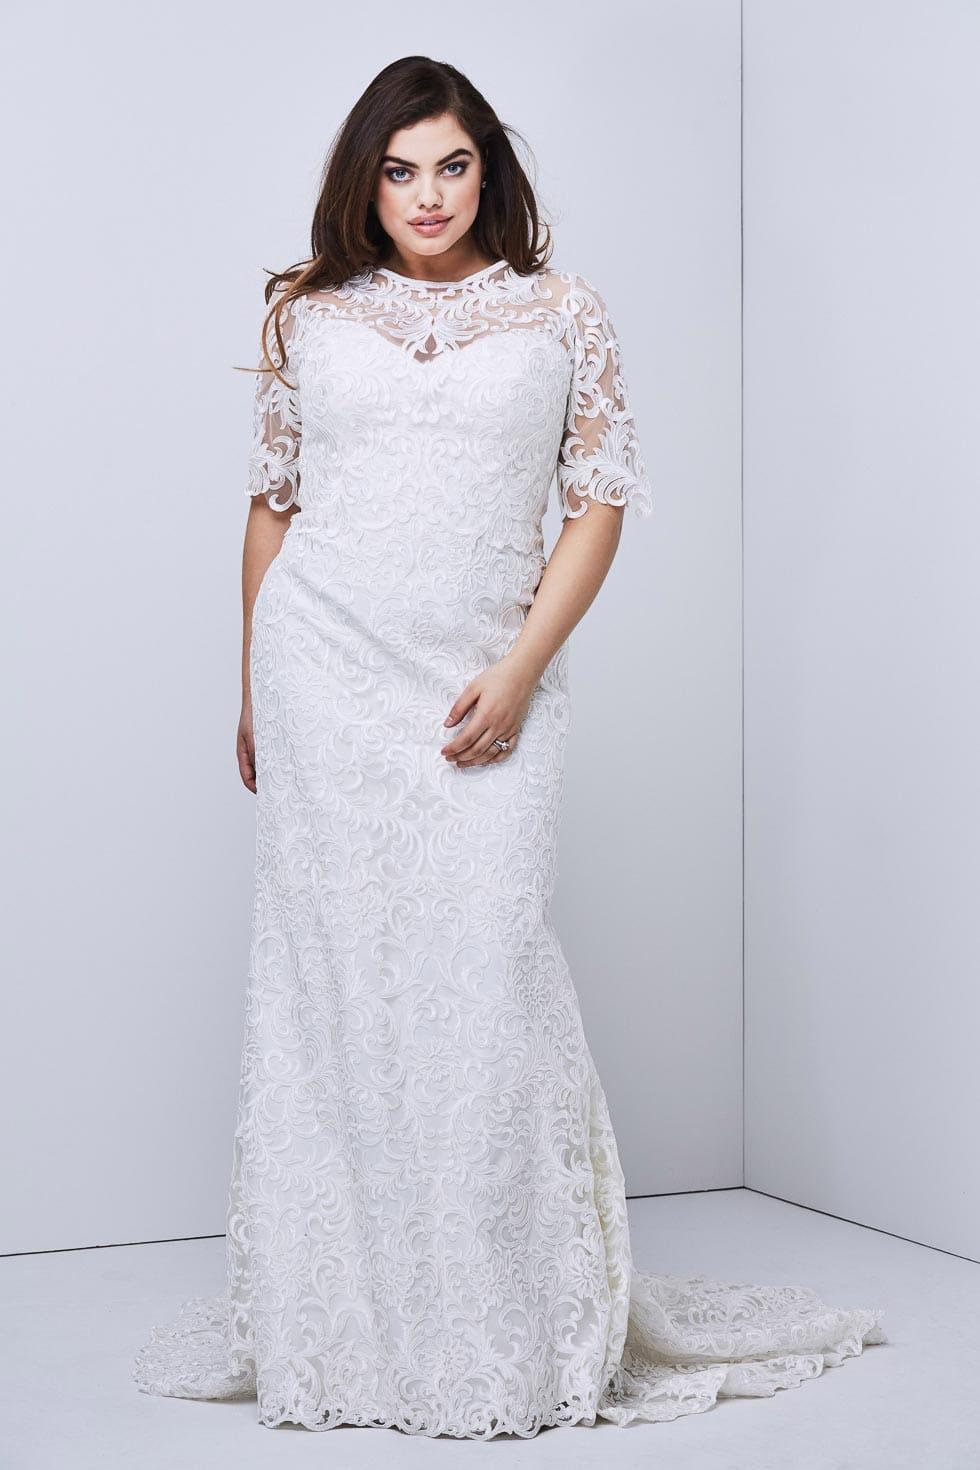 104 Atemberaubende Brautkleider In Grossen Grossen